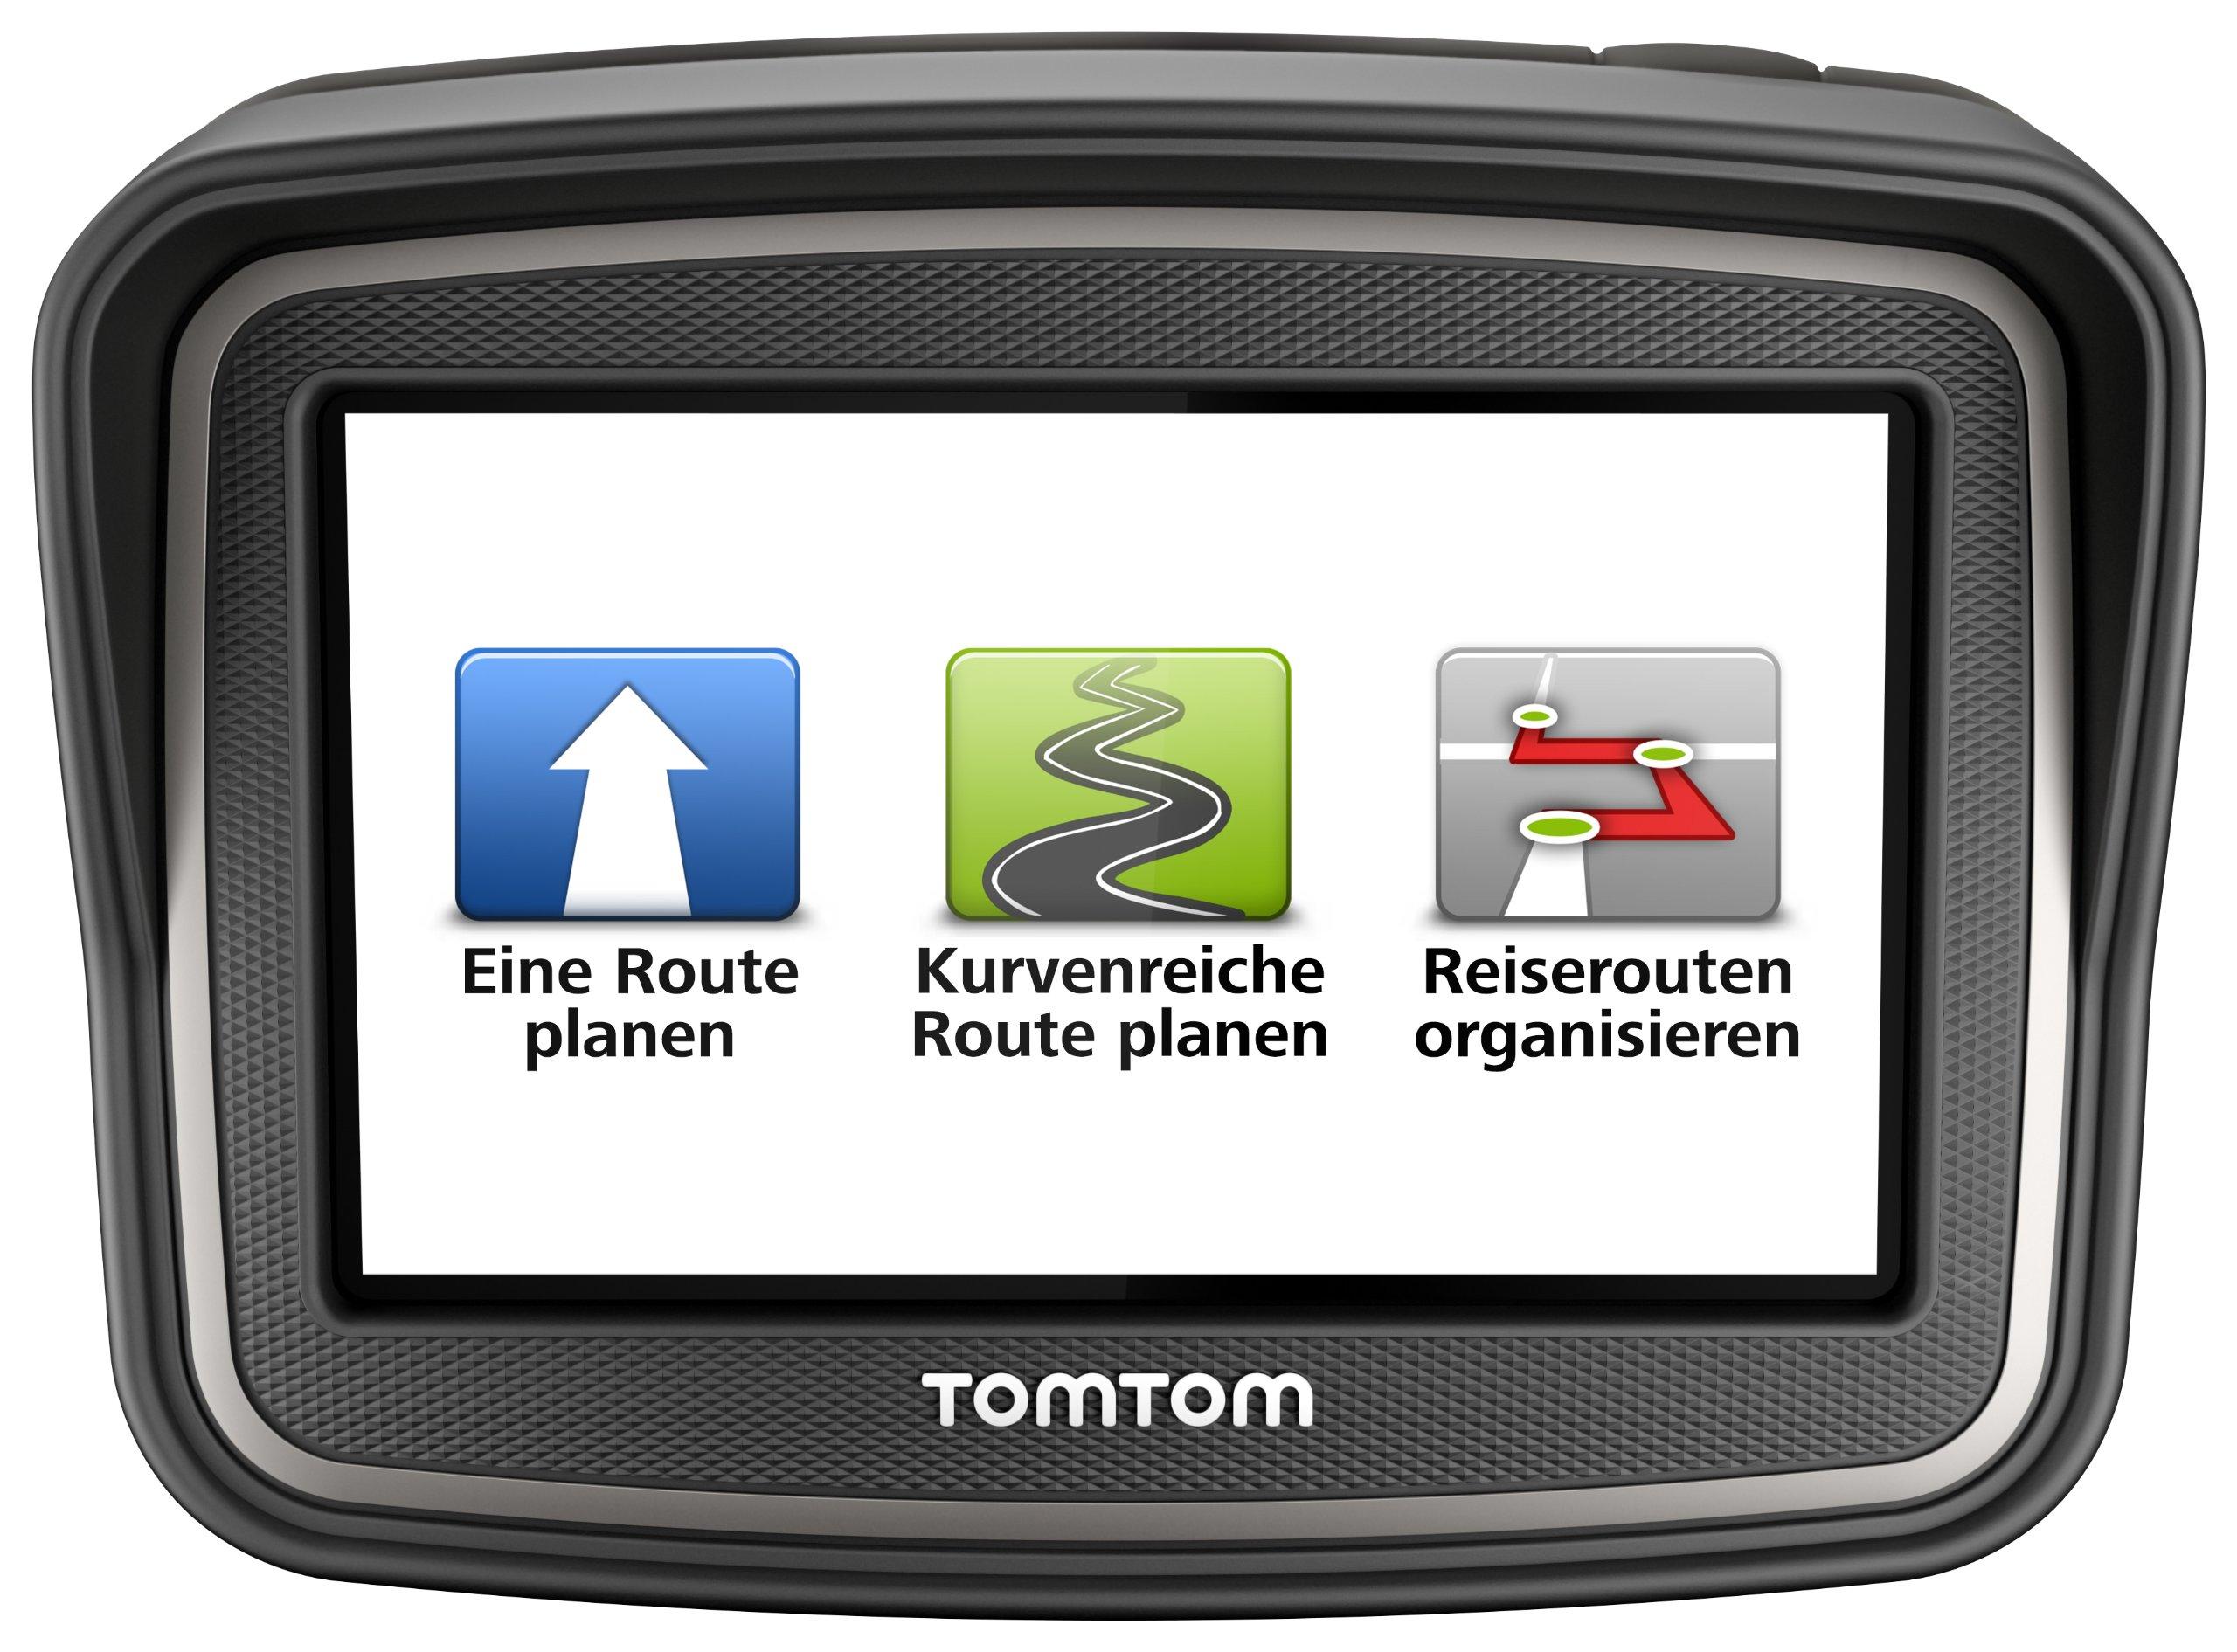 TOMTOM TomTom RIDER - Premium Kit - receptor GPS - motocicleta ...